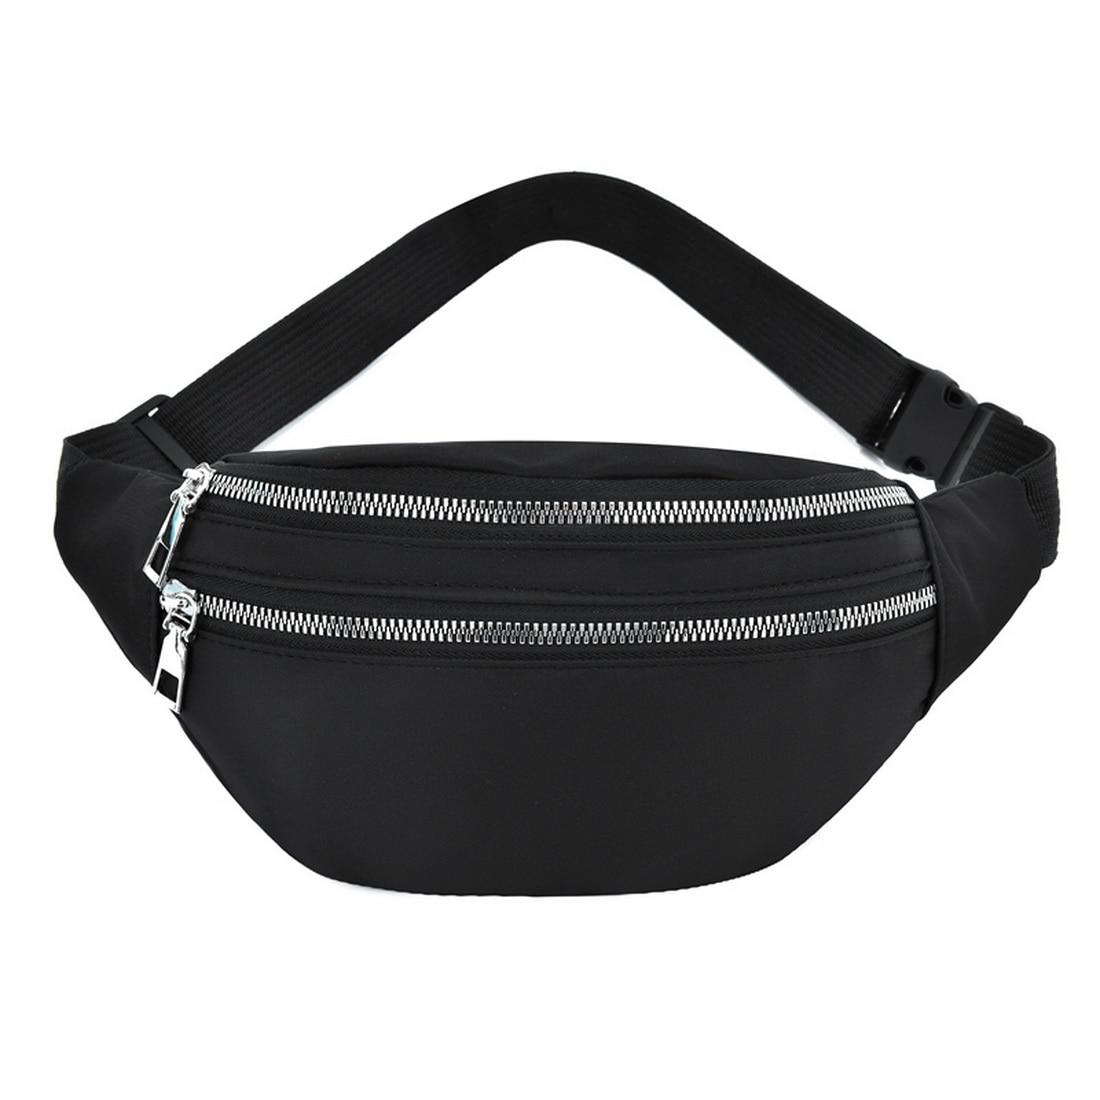 AliExpress - Women Waist Bag Men Fanny Pack Female Banana Bag Hip Bum Money Pouch Ladies Fashion Travel Shoulder Purse Belly Pocket